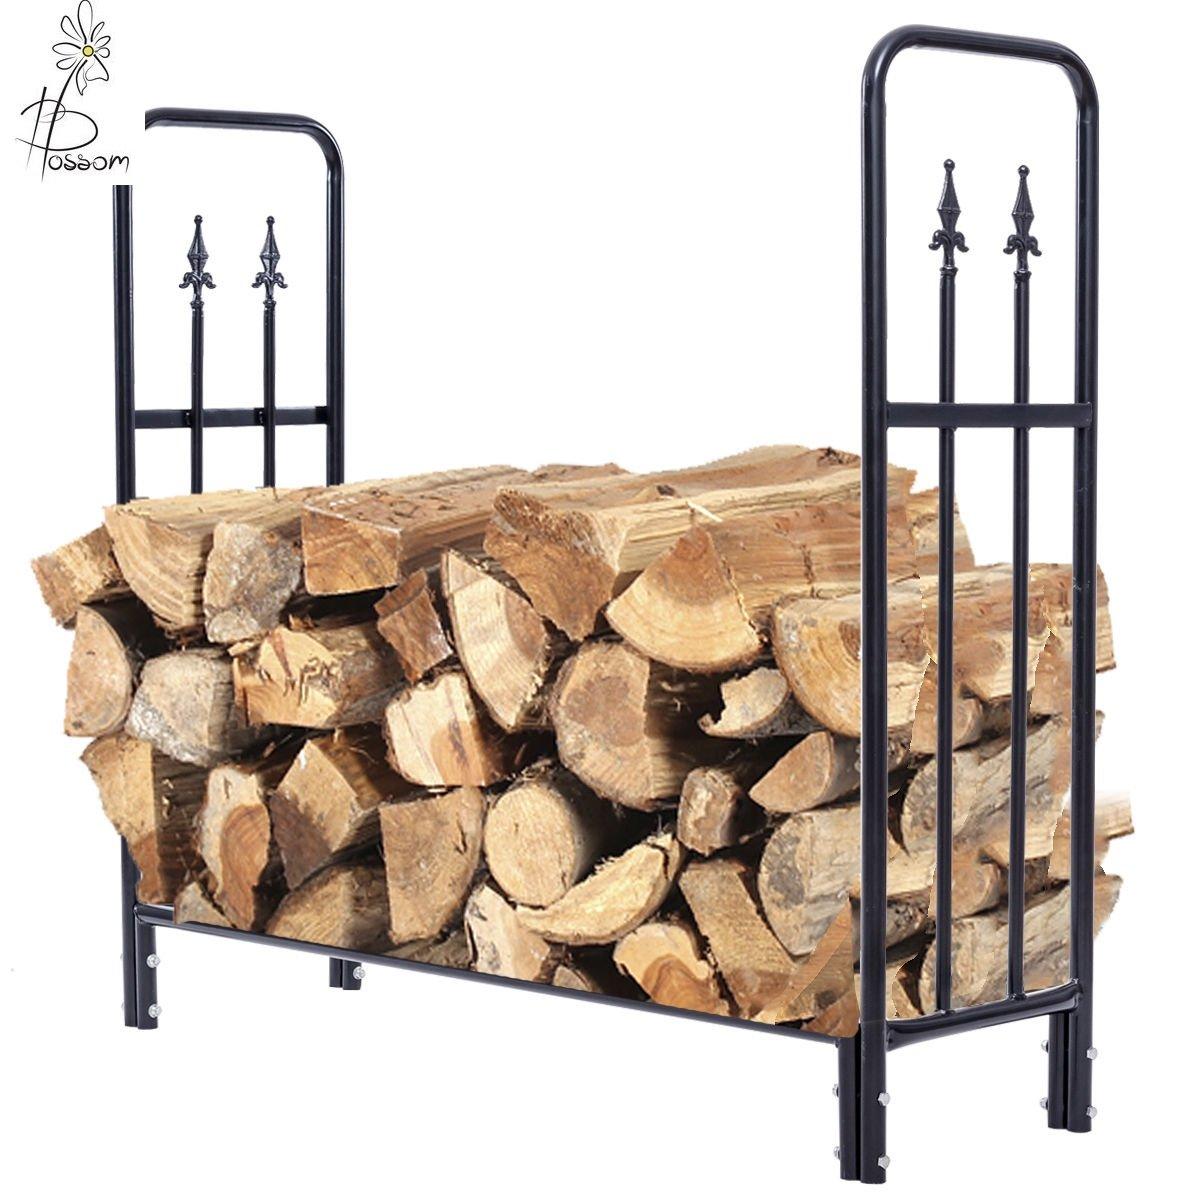 Blossom Store 4 Feet Outdoor Heavy Duty Steel Firewood Log Rack Wood Storage Holder Black by